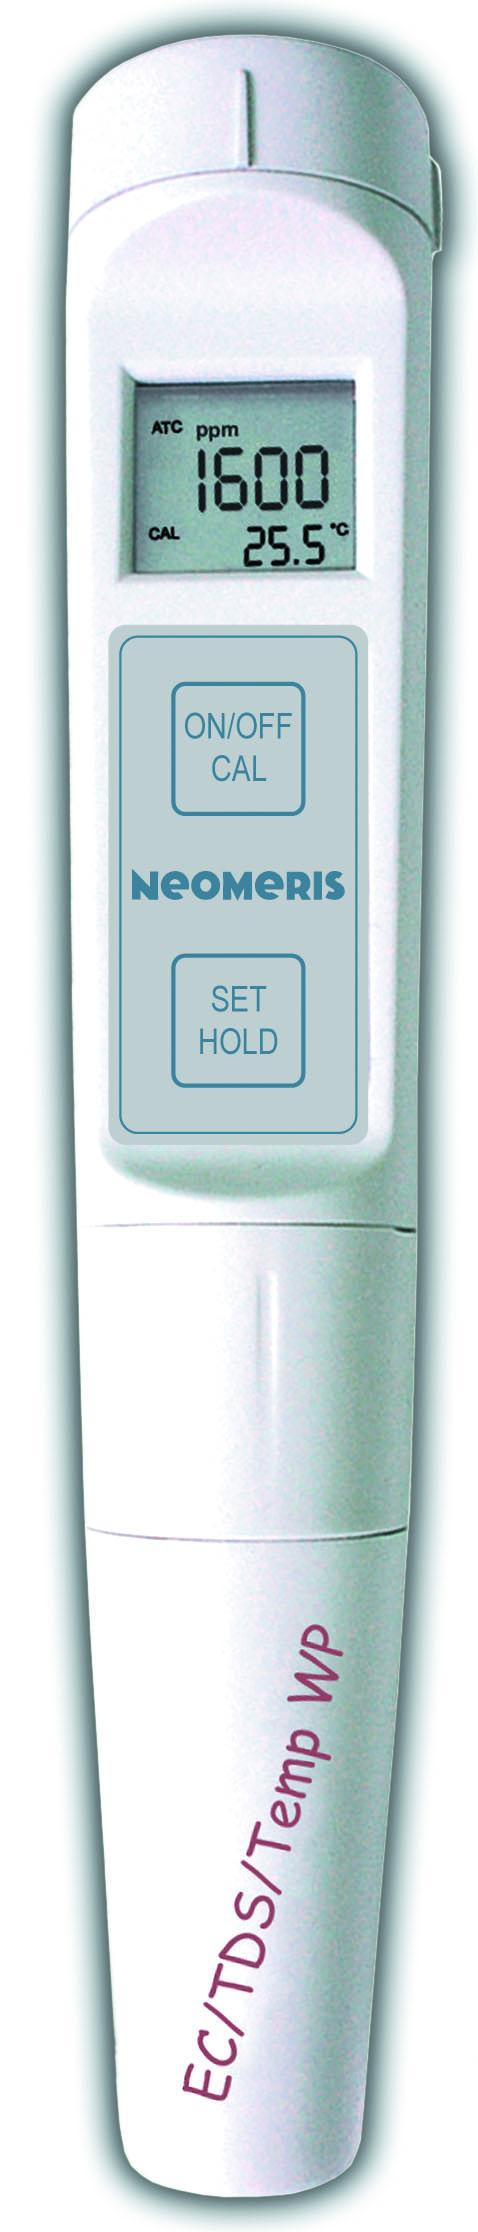 Neomeris EC/T Pocket-Tester